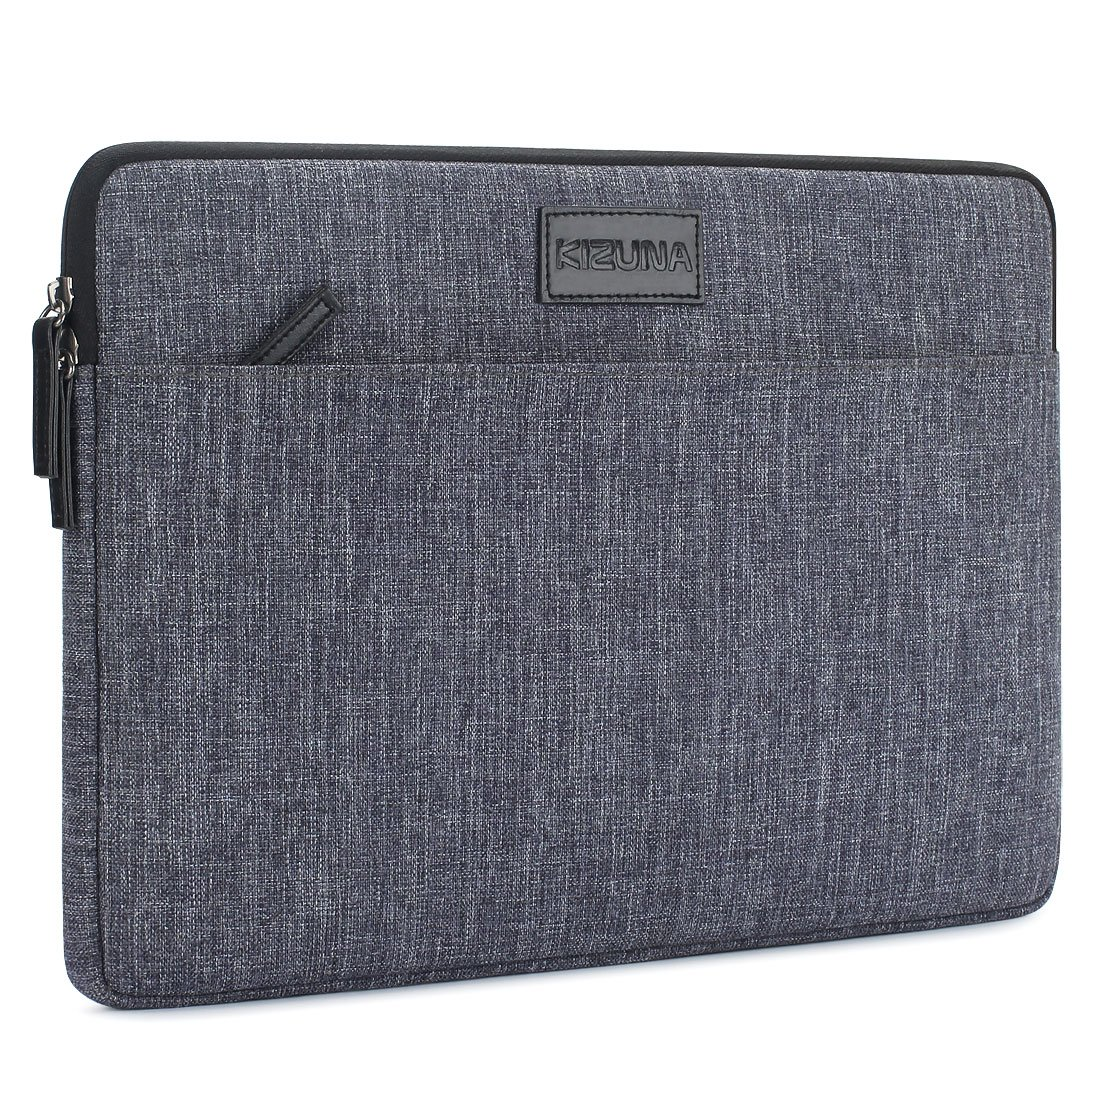 "KIZUNA Laptop Sleeve 15.6 Inch Splash Resistant Shockproof Notebook Case Portable Carrying Bag for 15.6"" Computer/Lenovo/HP/Acer/ASUS/DELL, Grey"